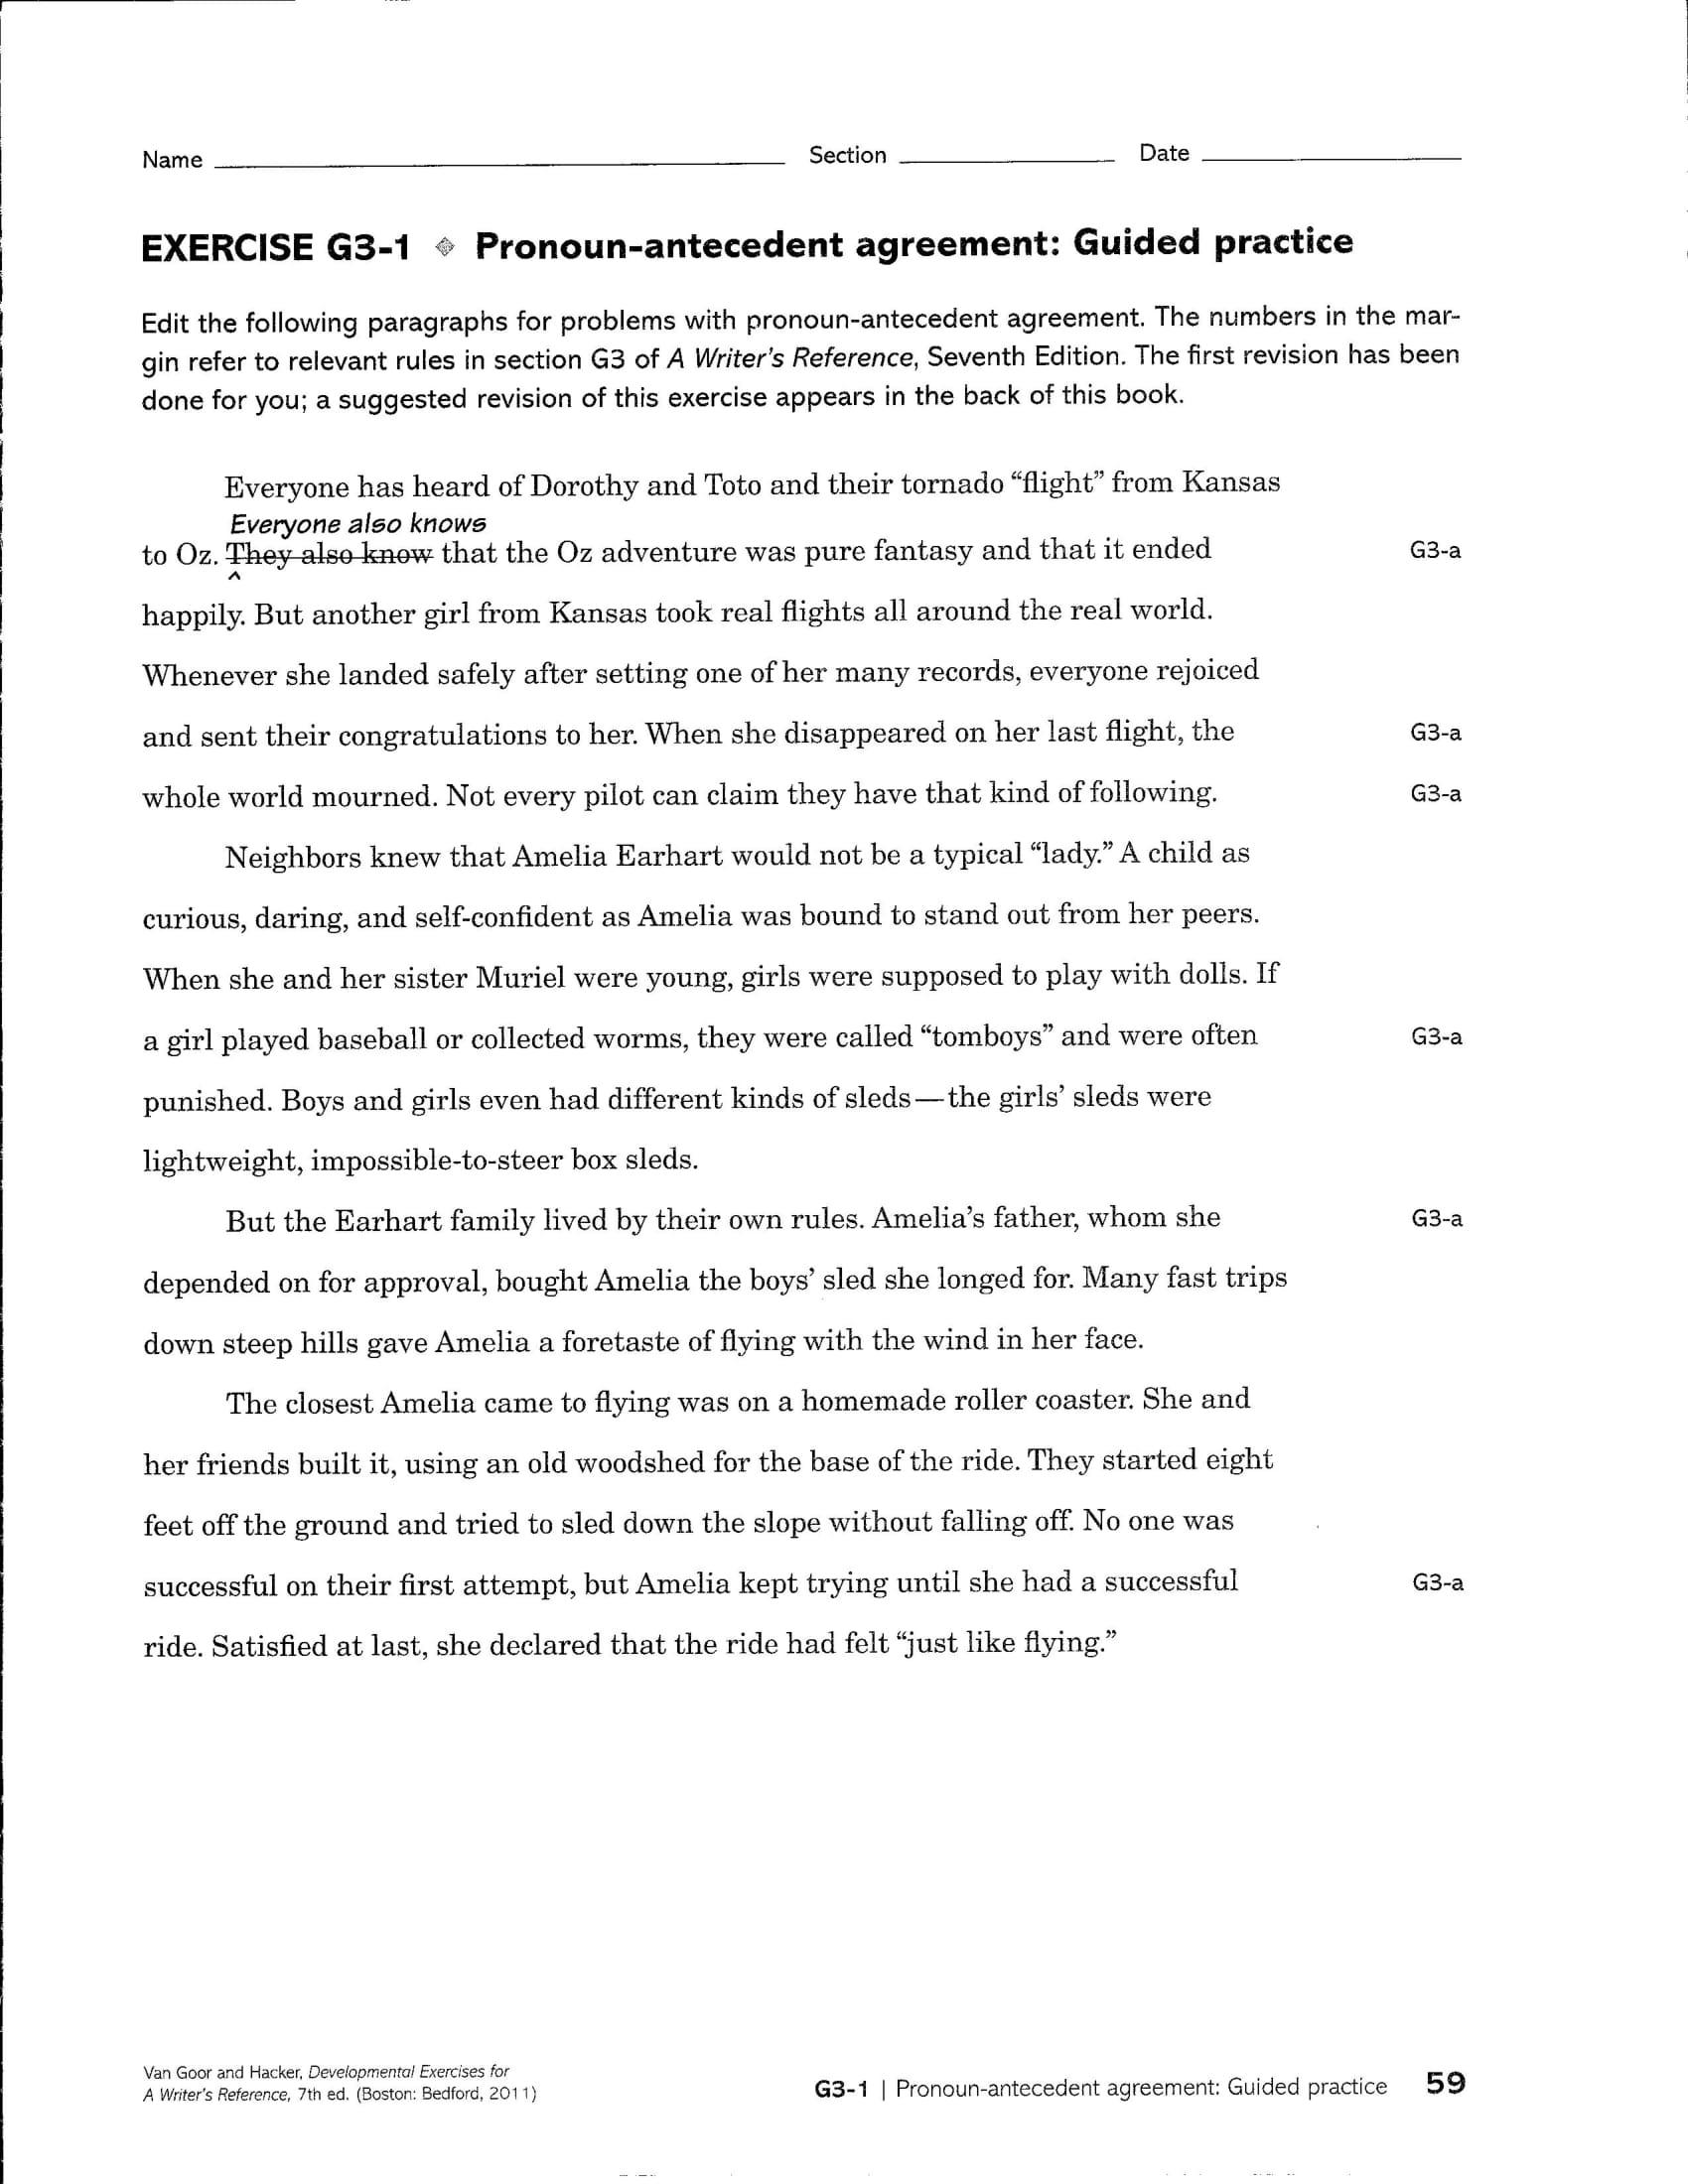 Pronoun Antecedent Agreement Guided Practice Sheet Example